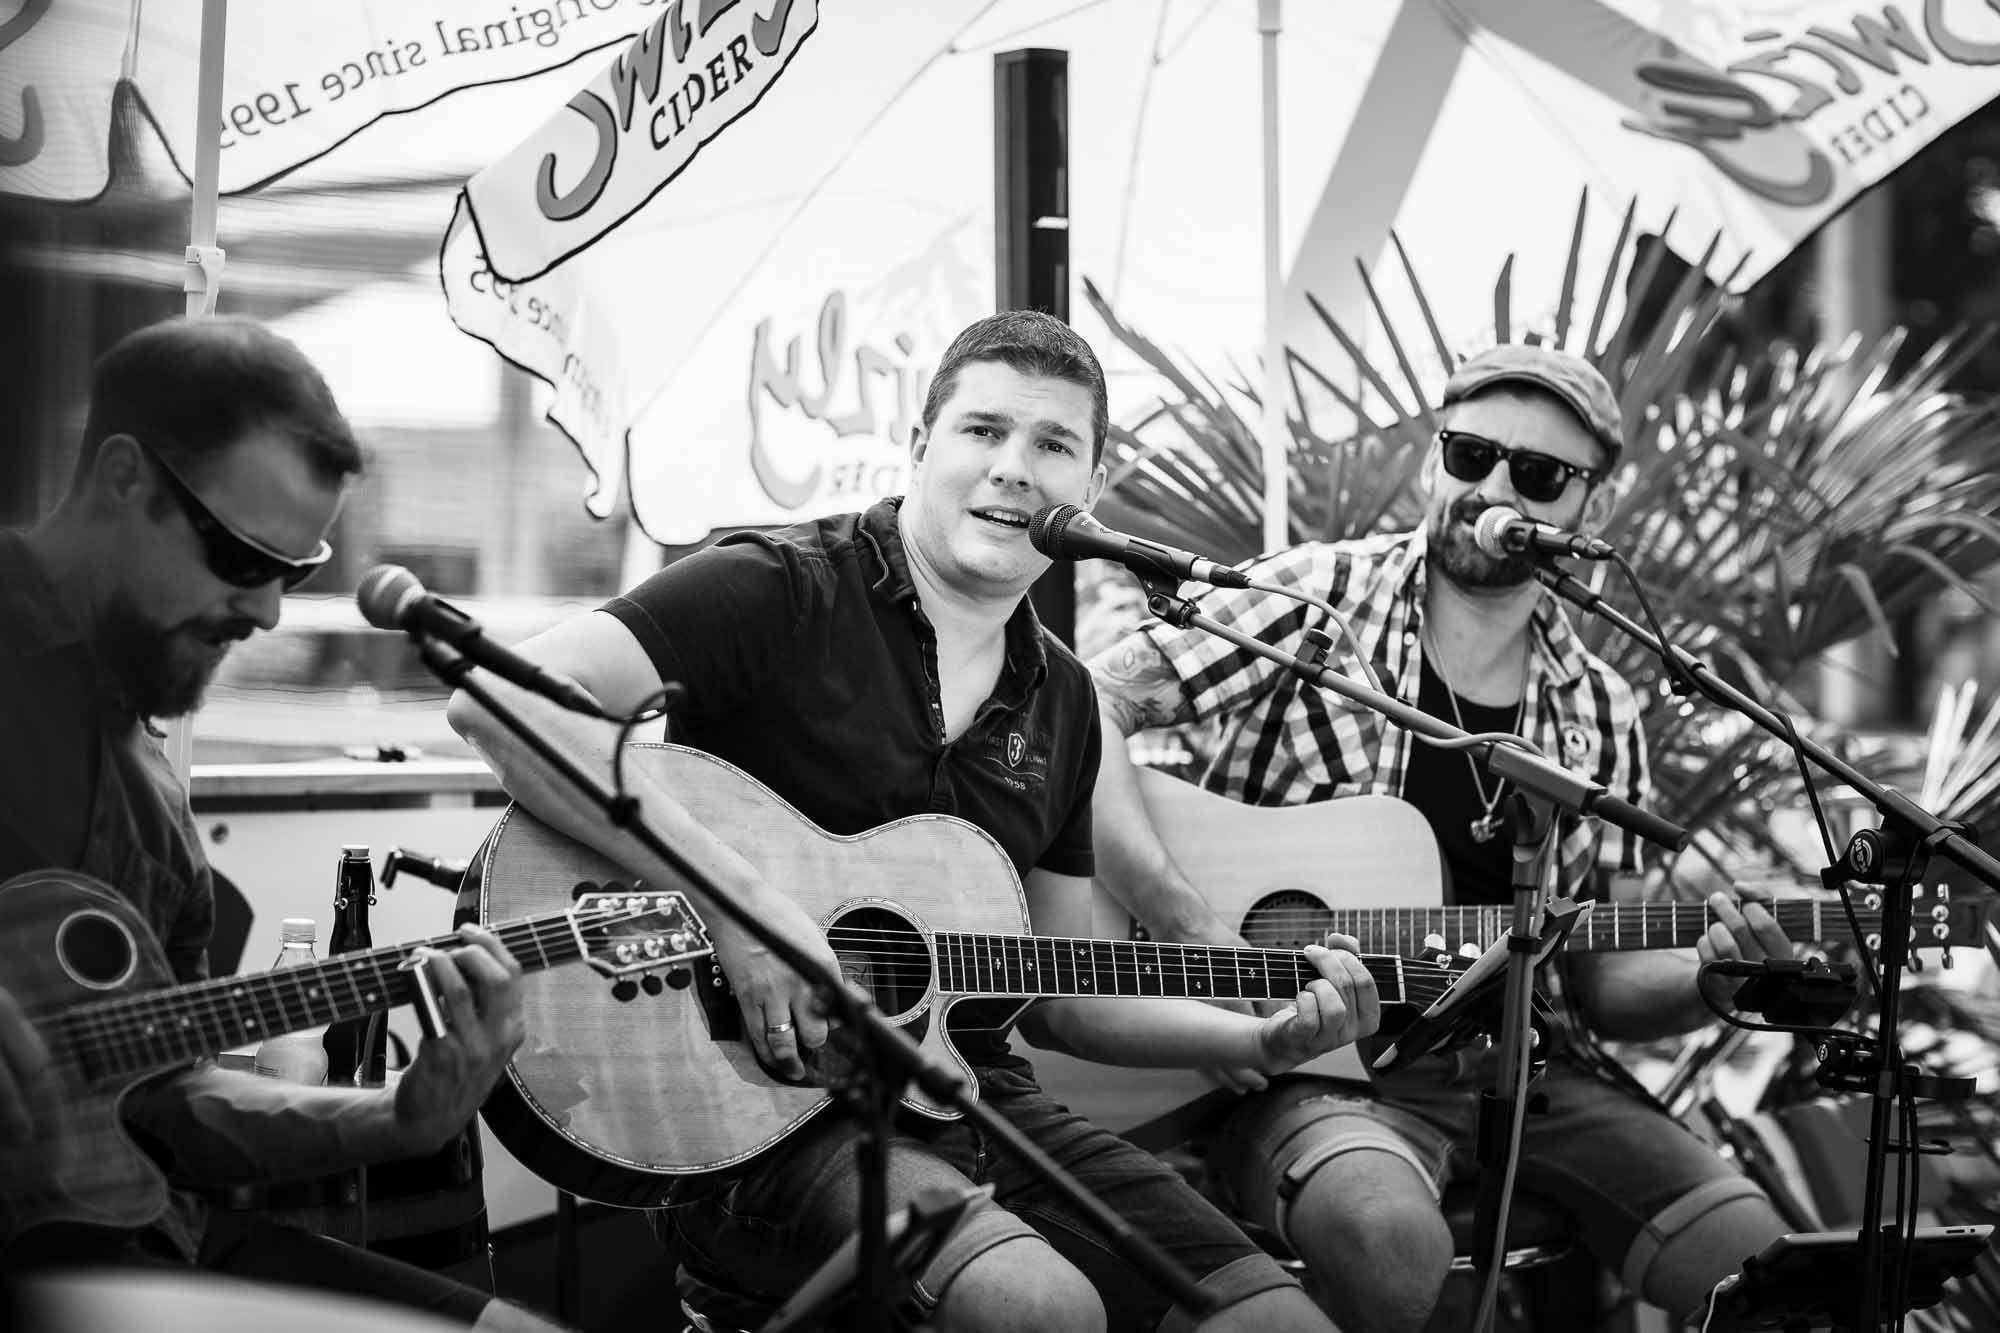 Akkustik Rockband mit drei Gitarren